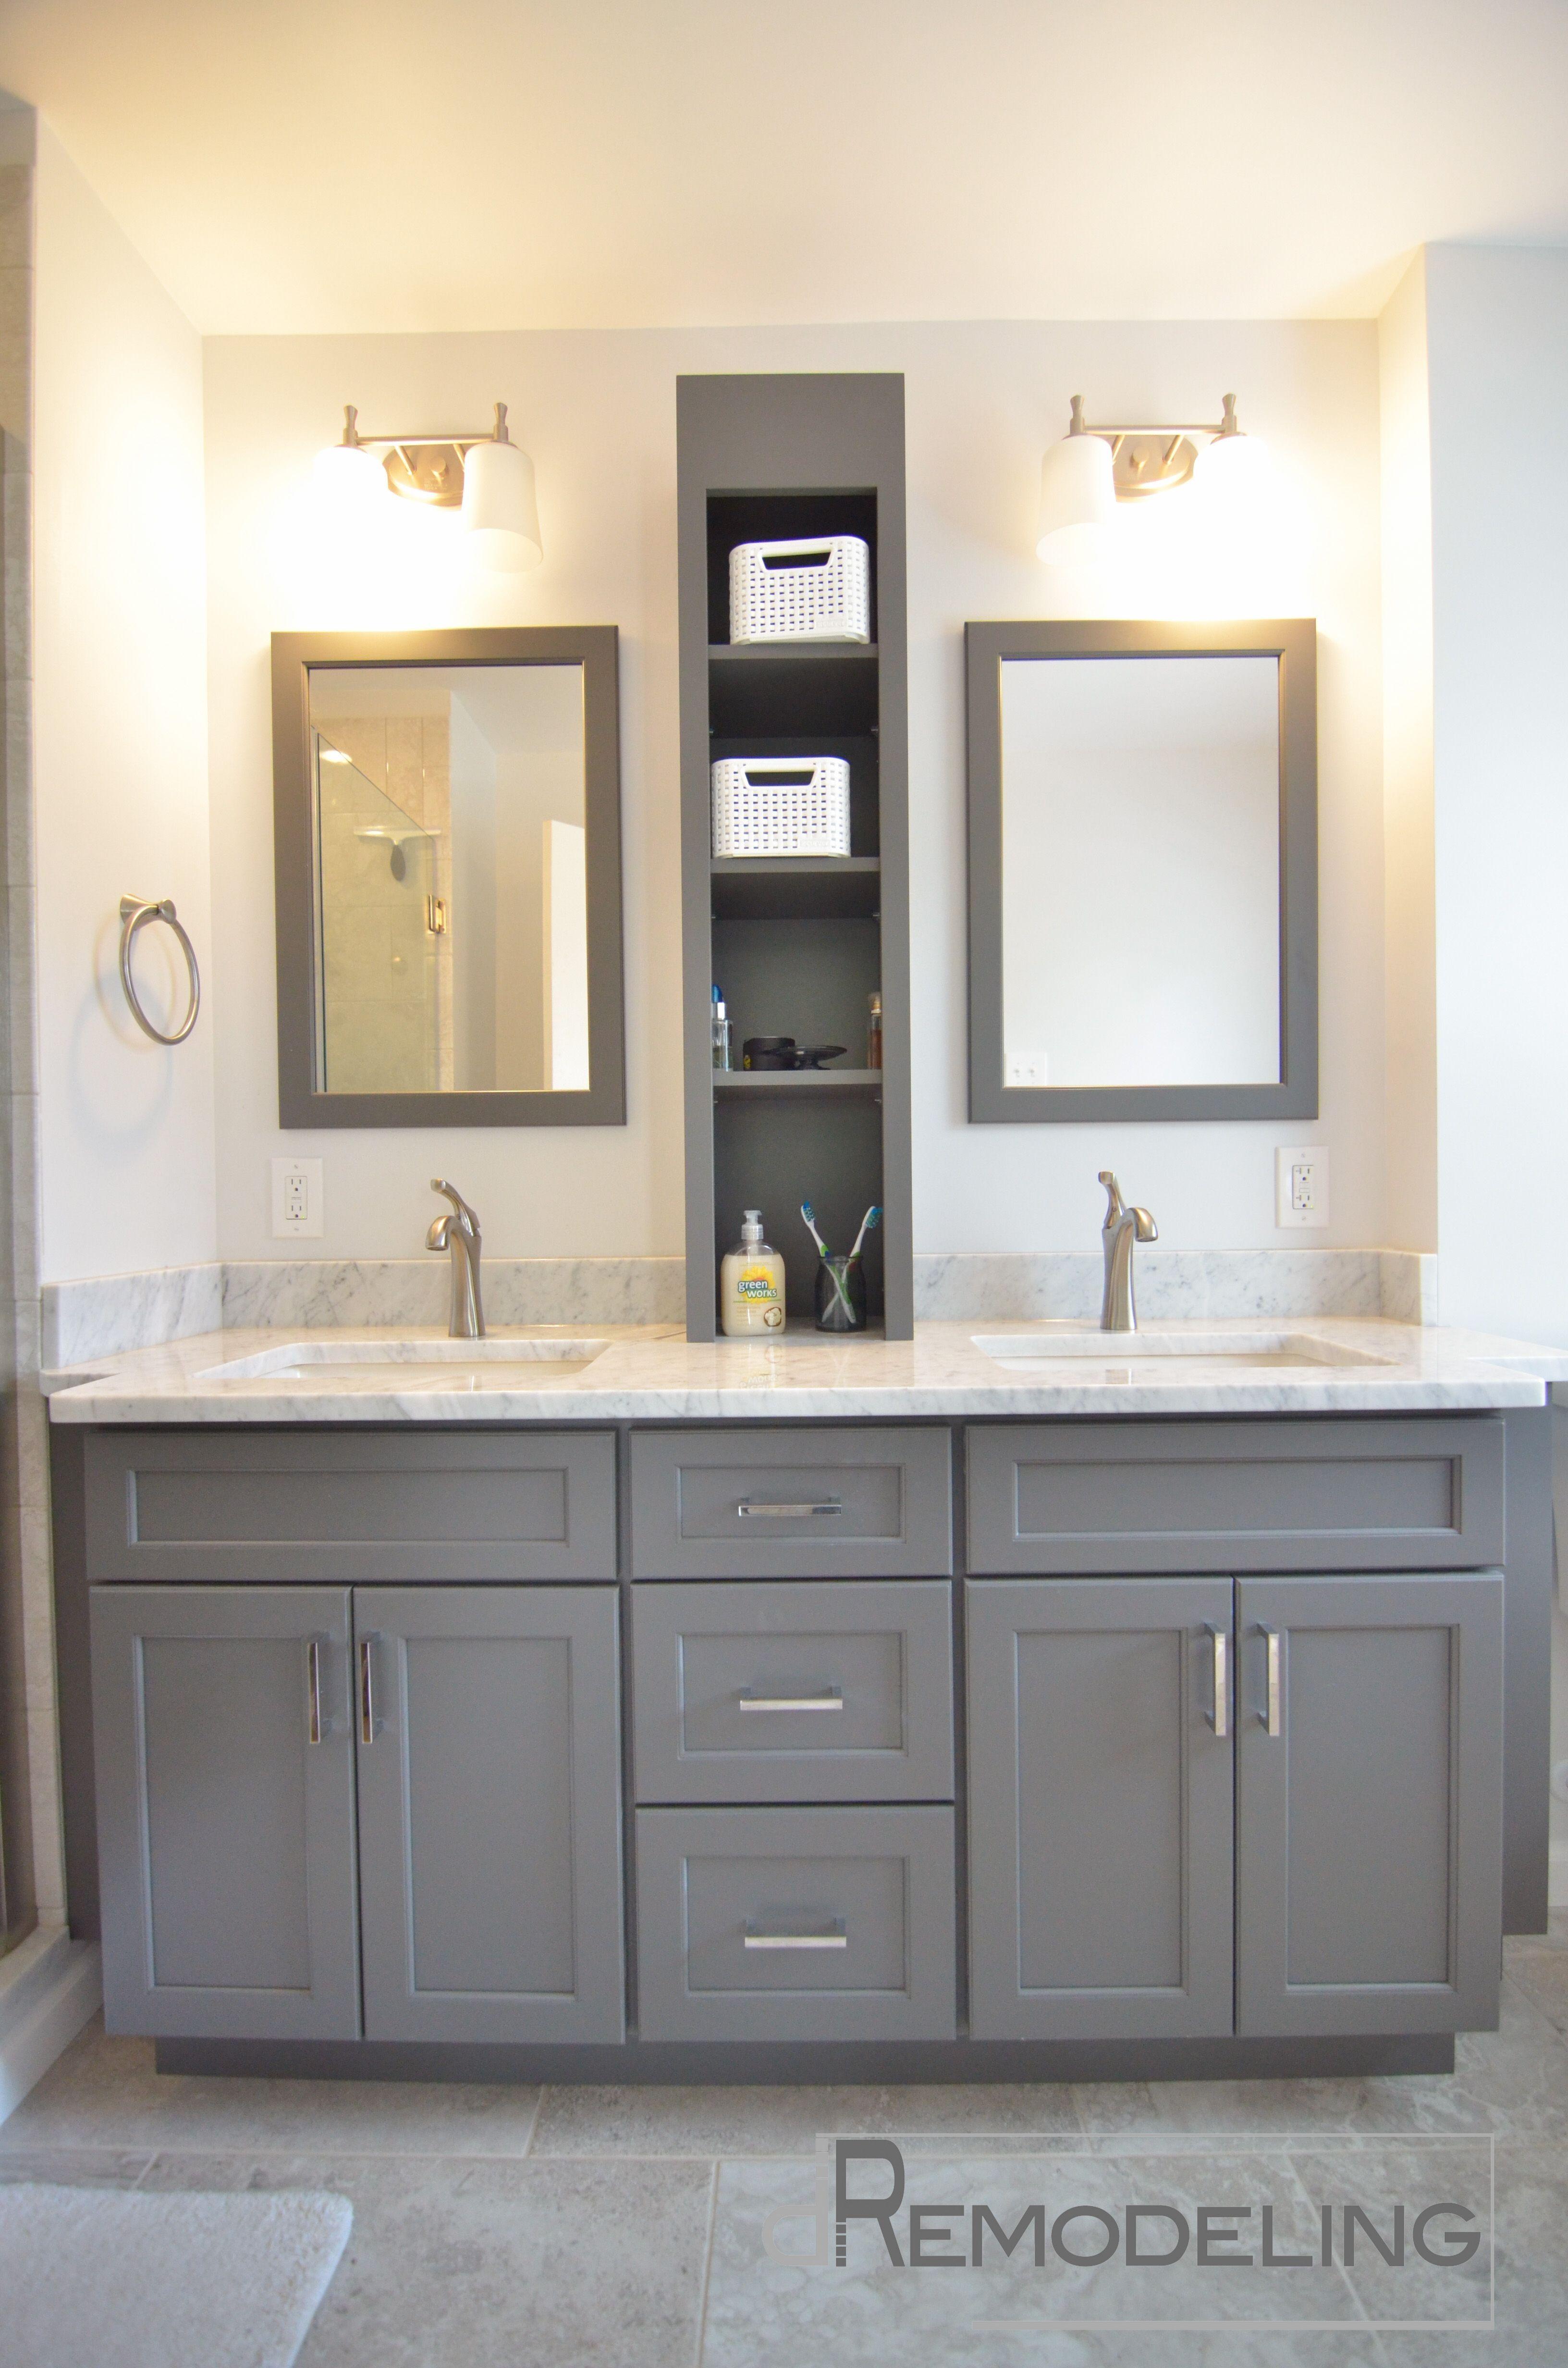 New Double Vanity Bathroom Mirror Ideas Ij16kq Small Space